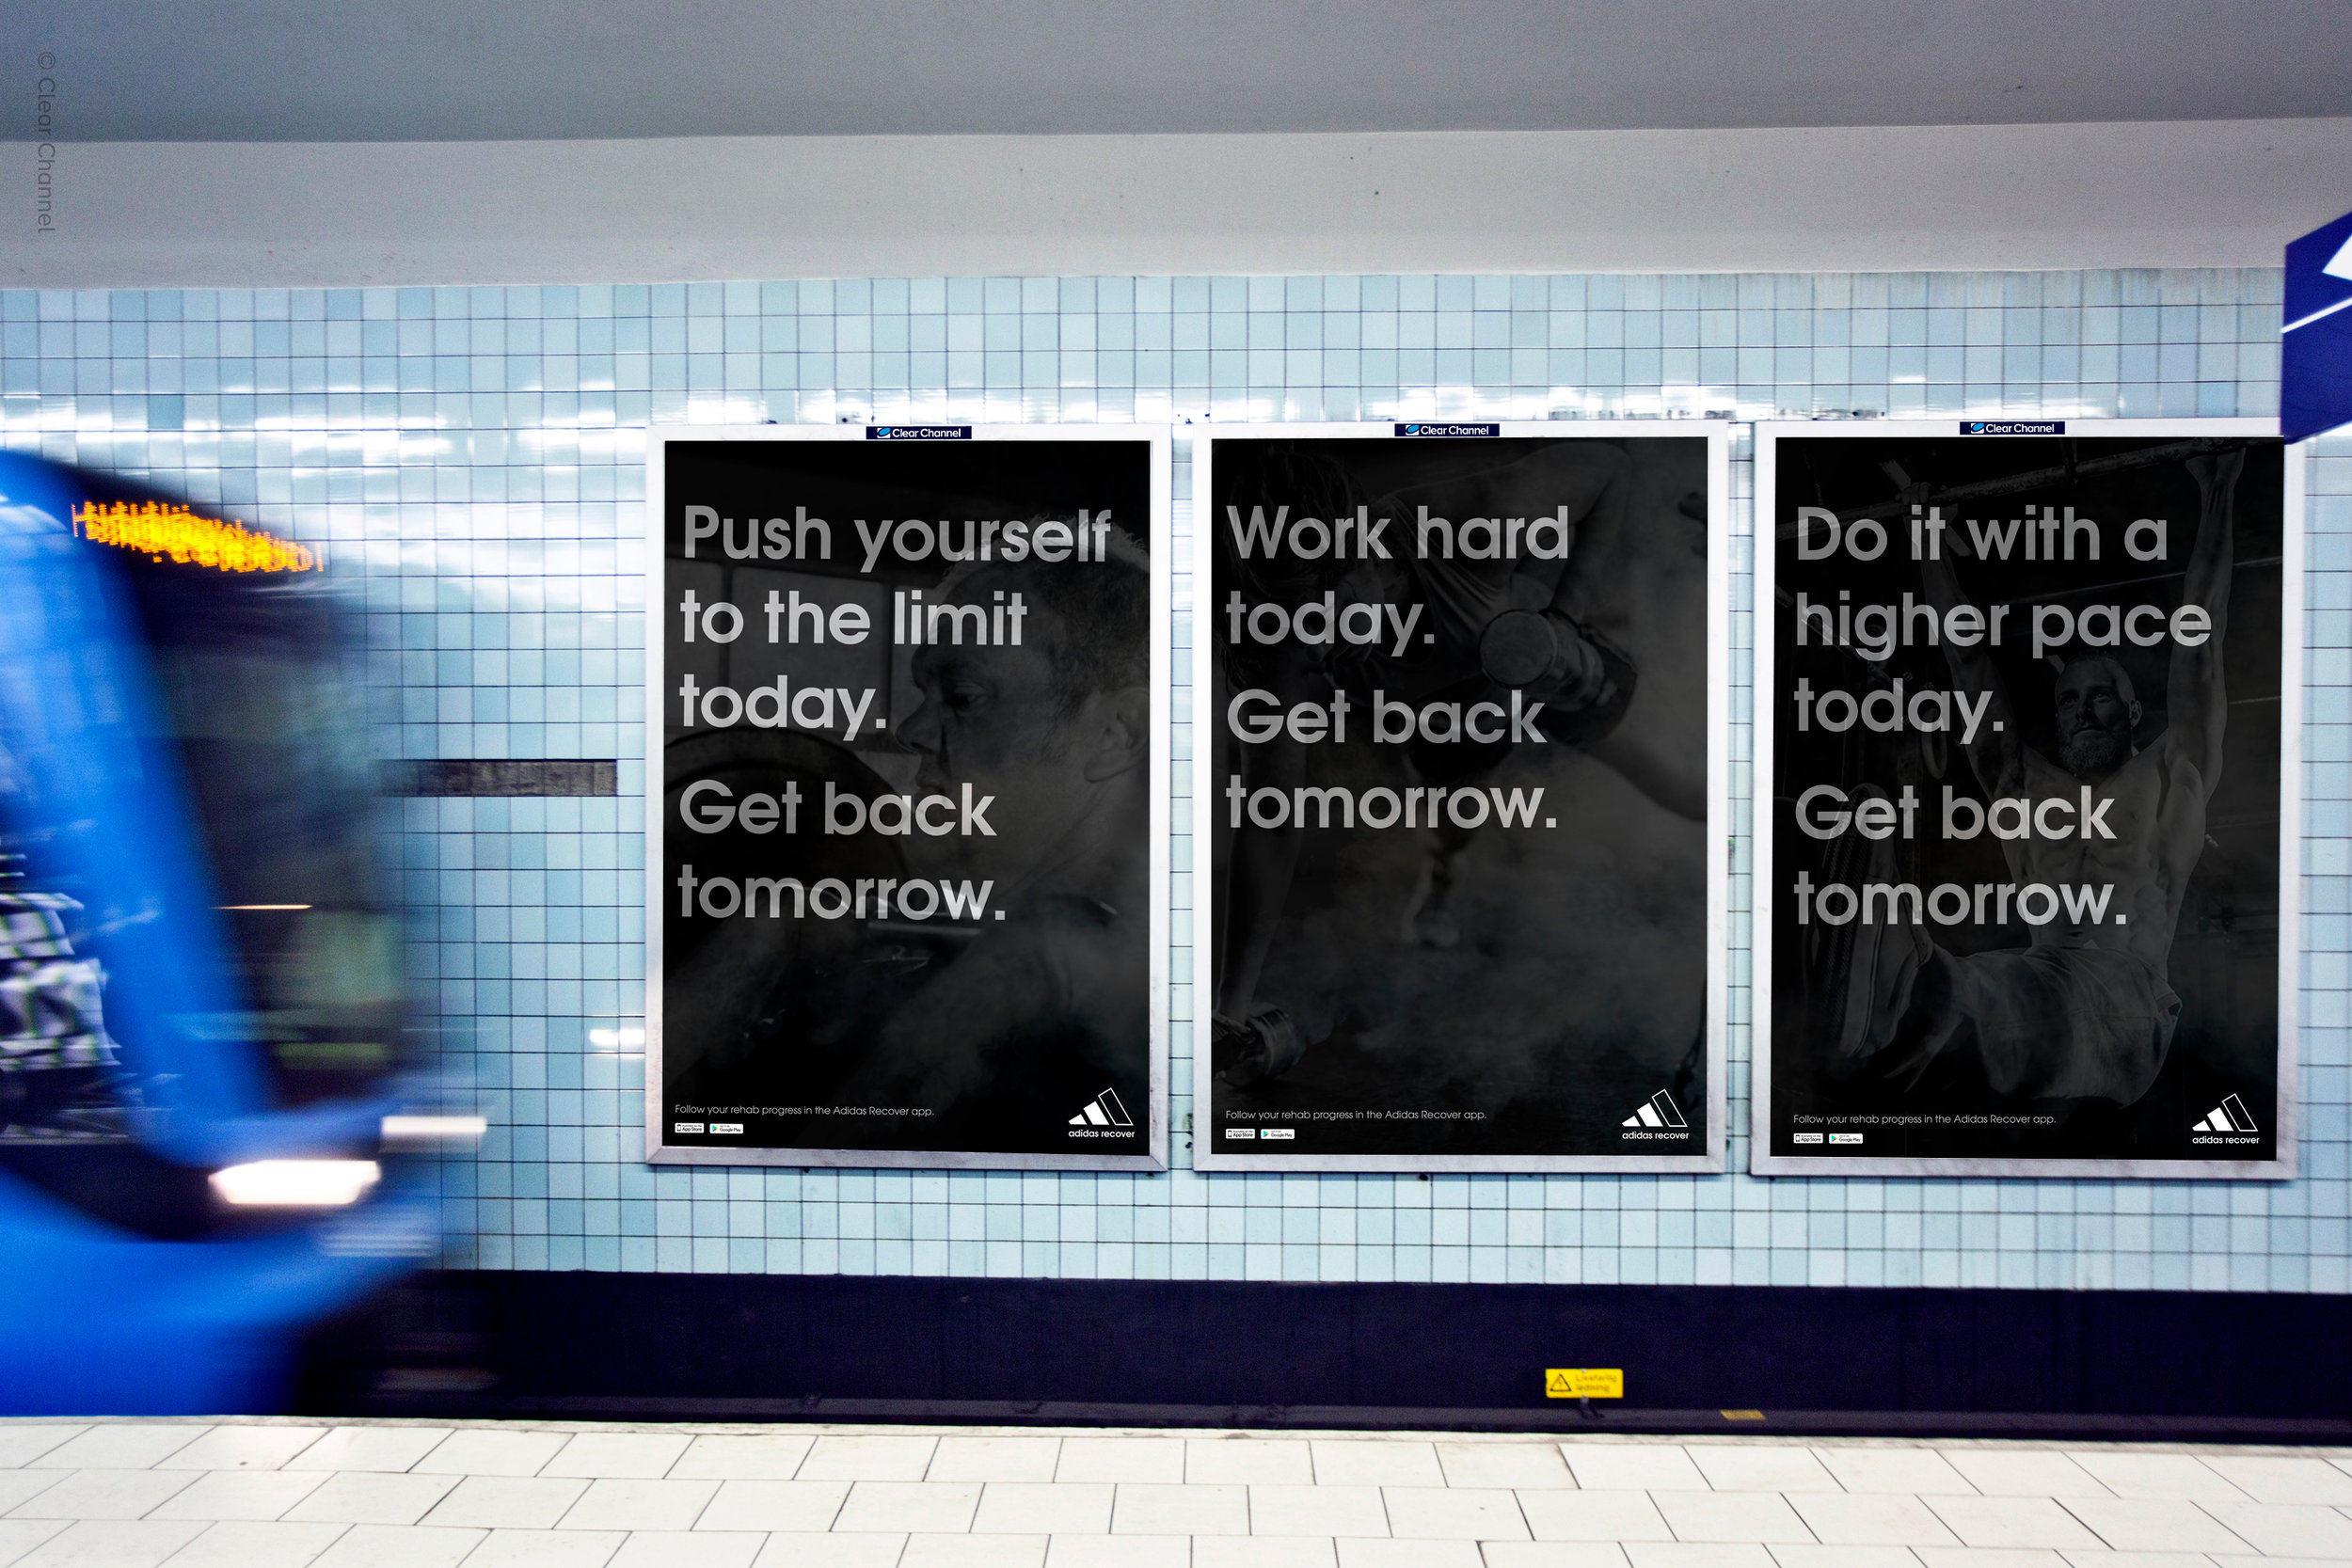 Adidas Recover mockup inspirational.jpg